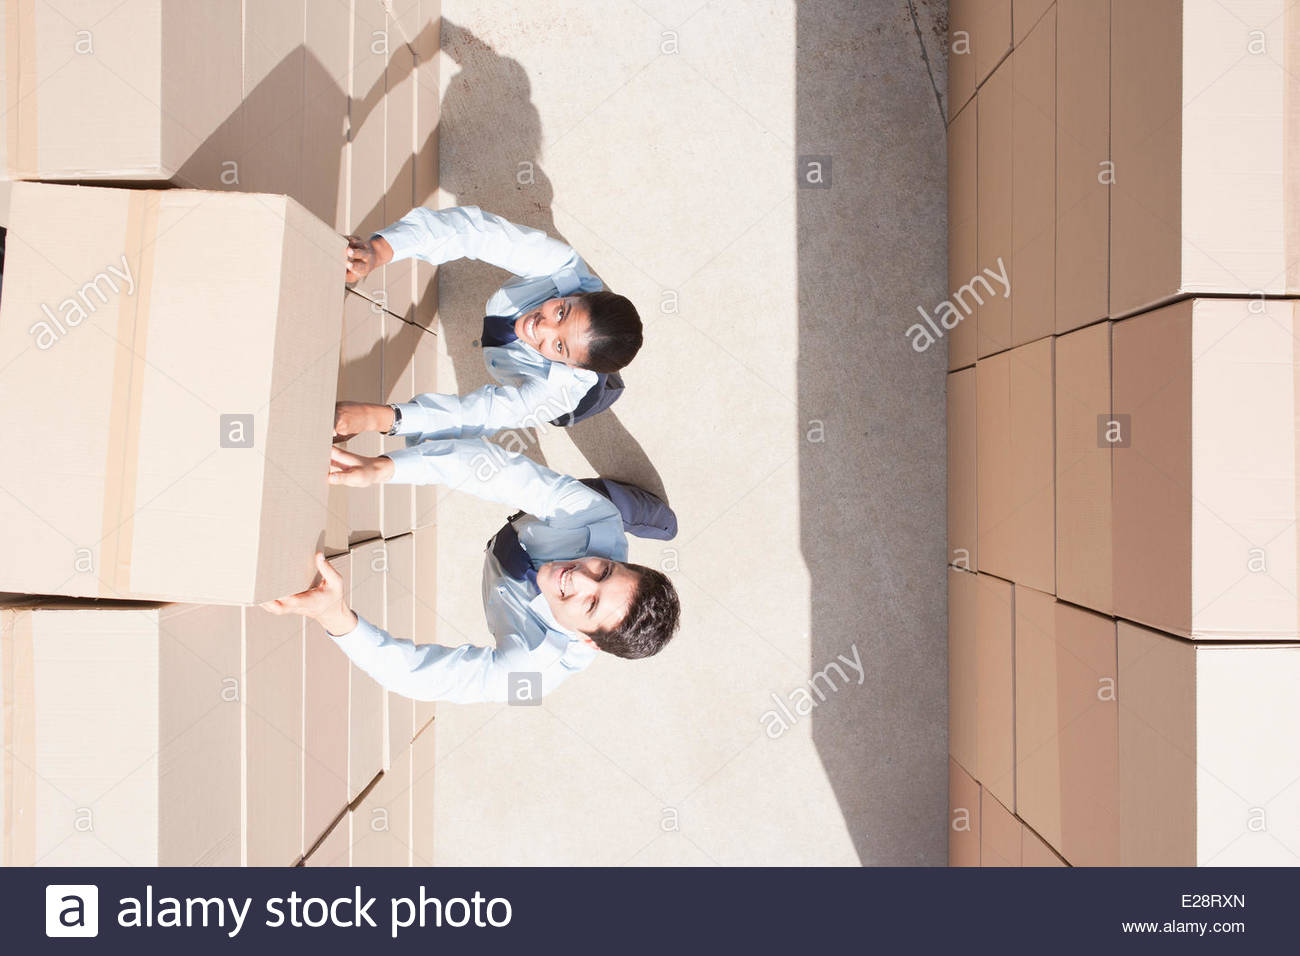 Workers standing avec pile de cartons Photo Stock